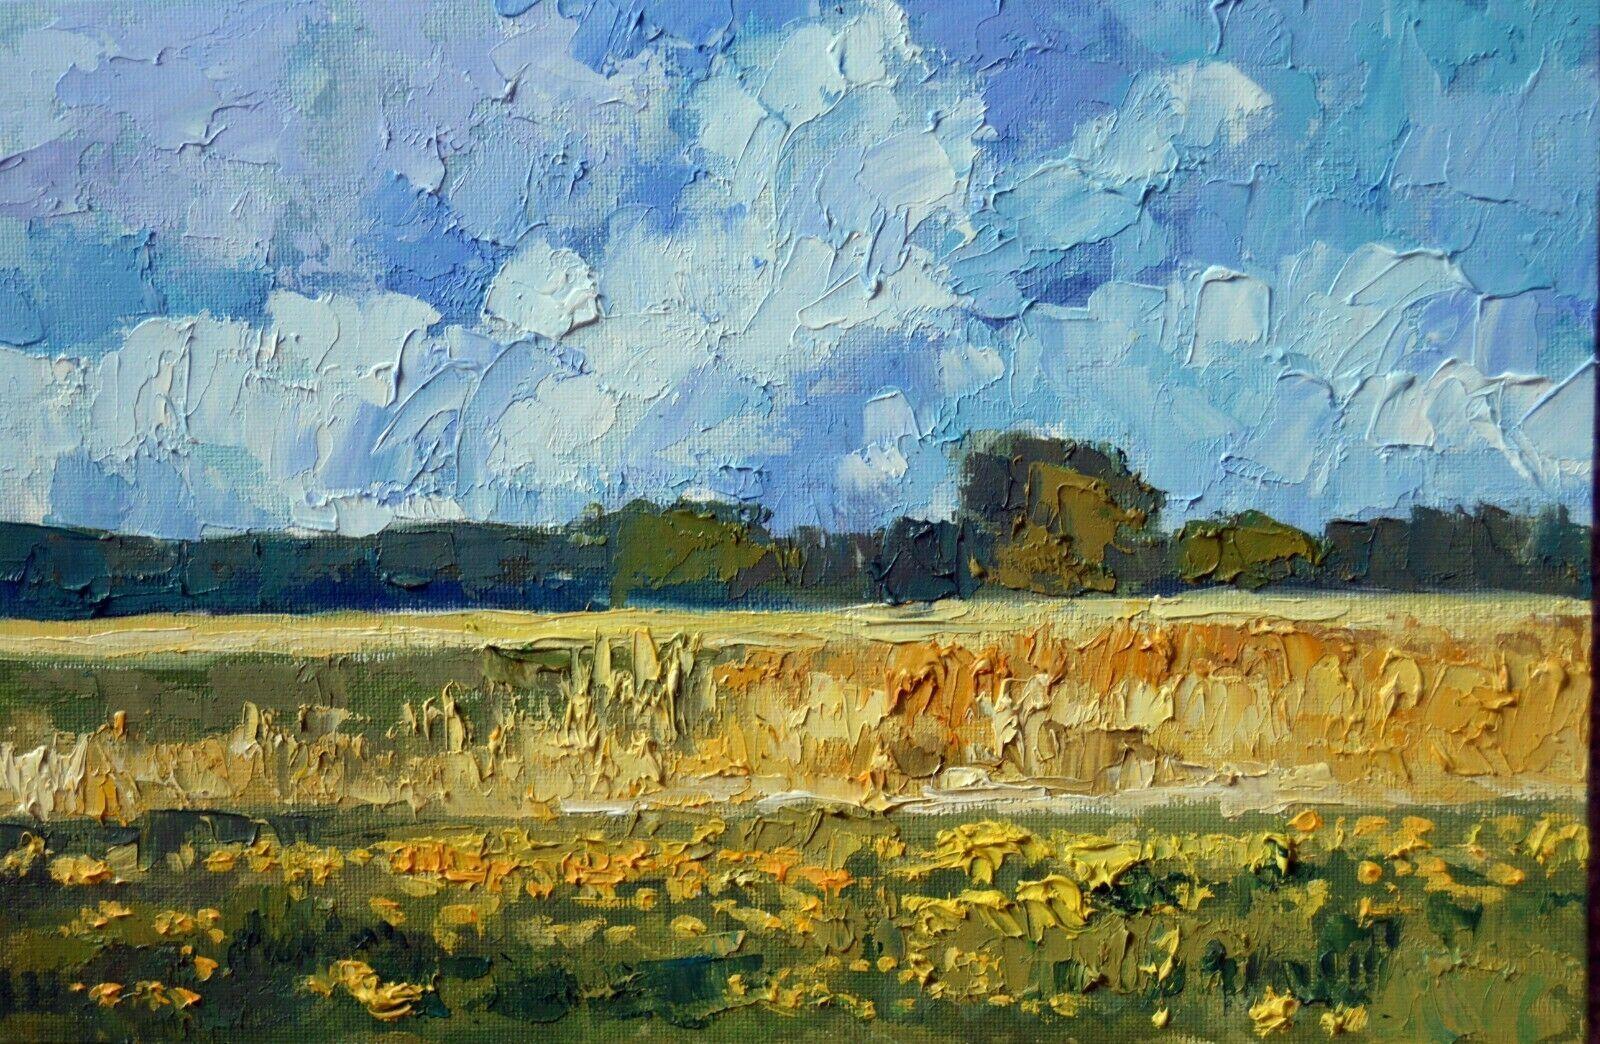 Fields Of Grain Harvest Impressionist Landscape Oil Painting Idkowiak Painting Ideas Of Painting Painting Impressionist Landscape Painting Oil Painting